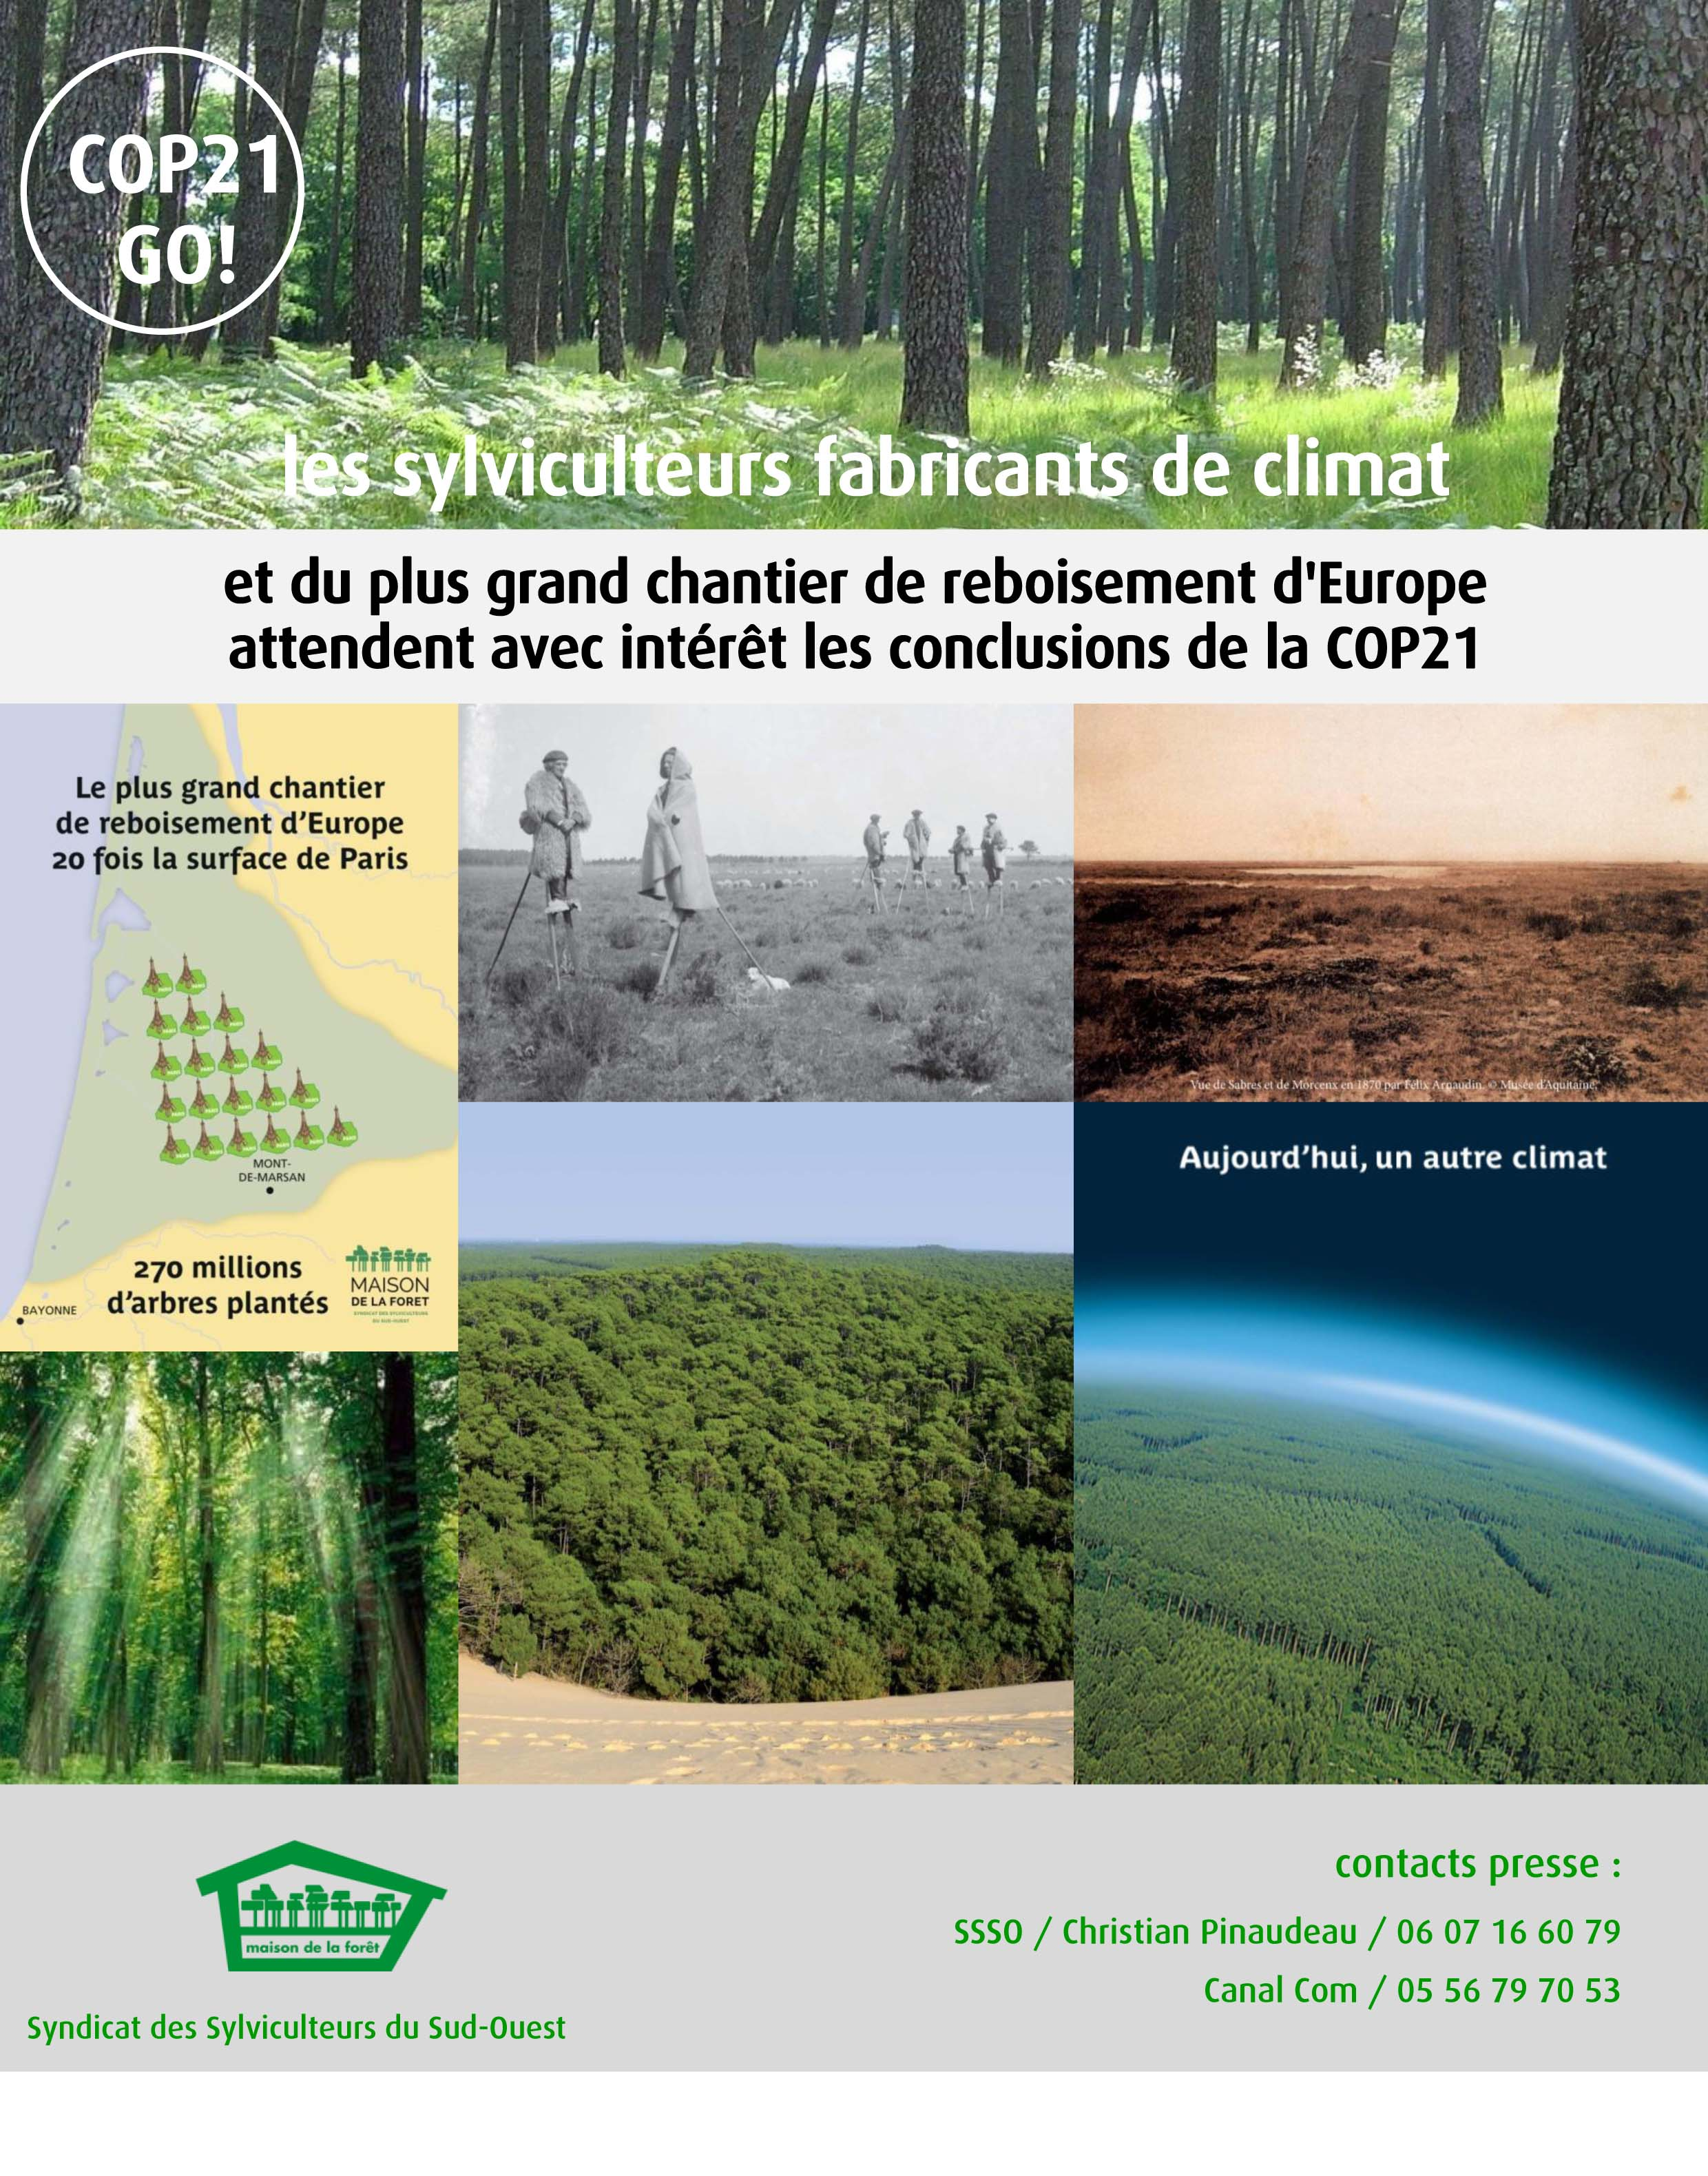 COP21_GO!-1